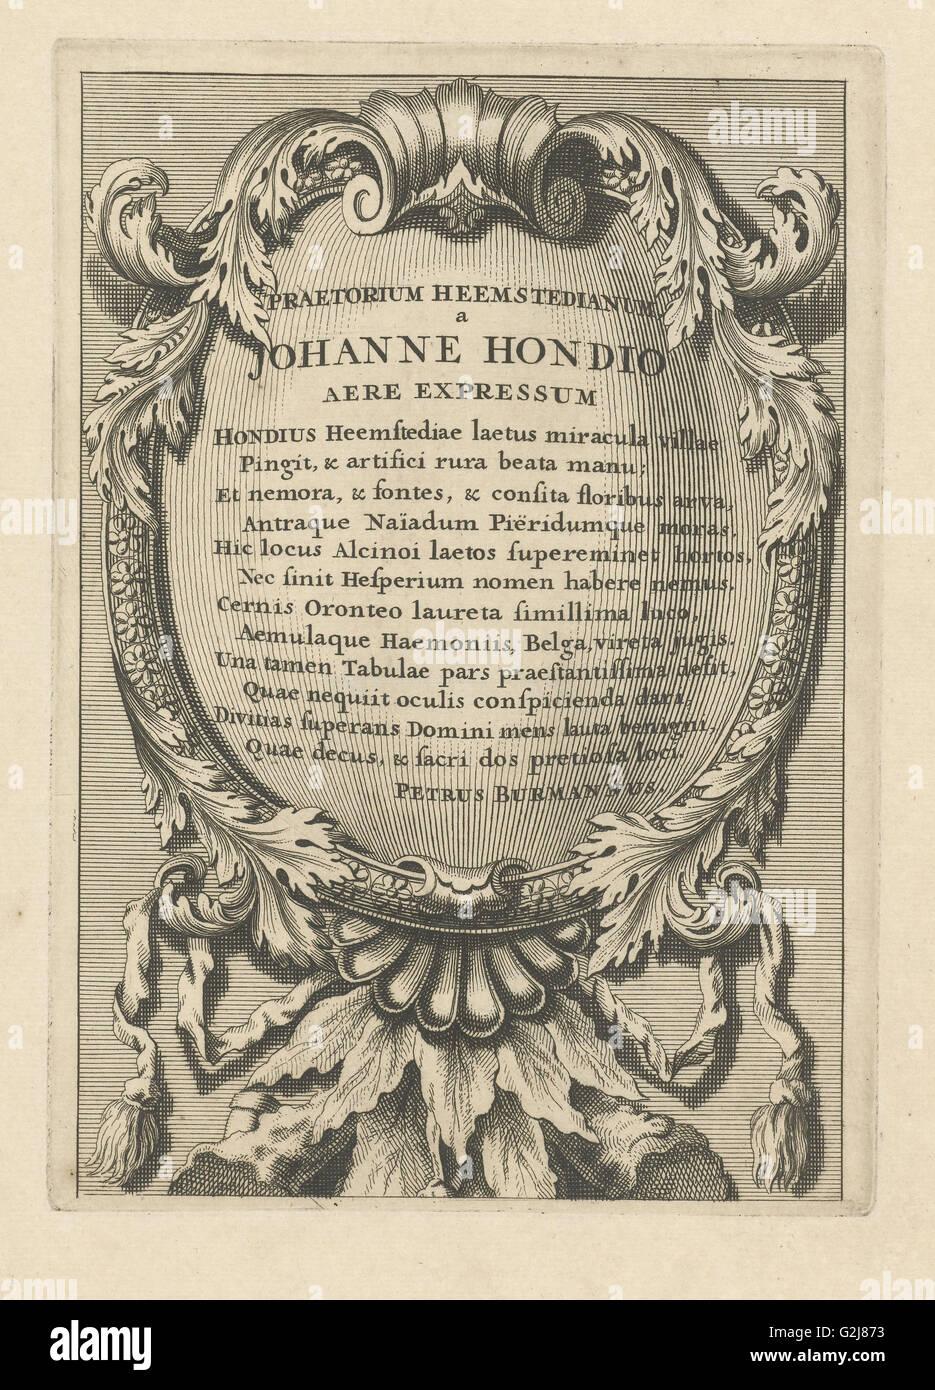 Kartusche mit lateinischer Text, Johannes Hondius, Pieter Burman, 1700-1799 Stockbild